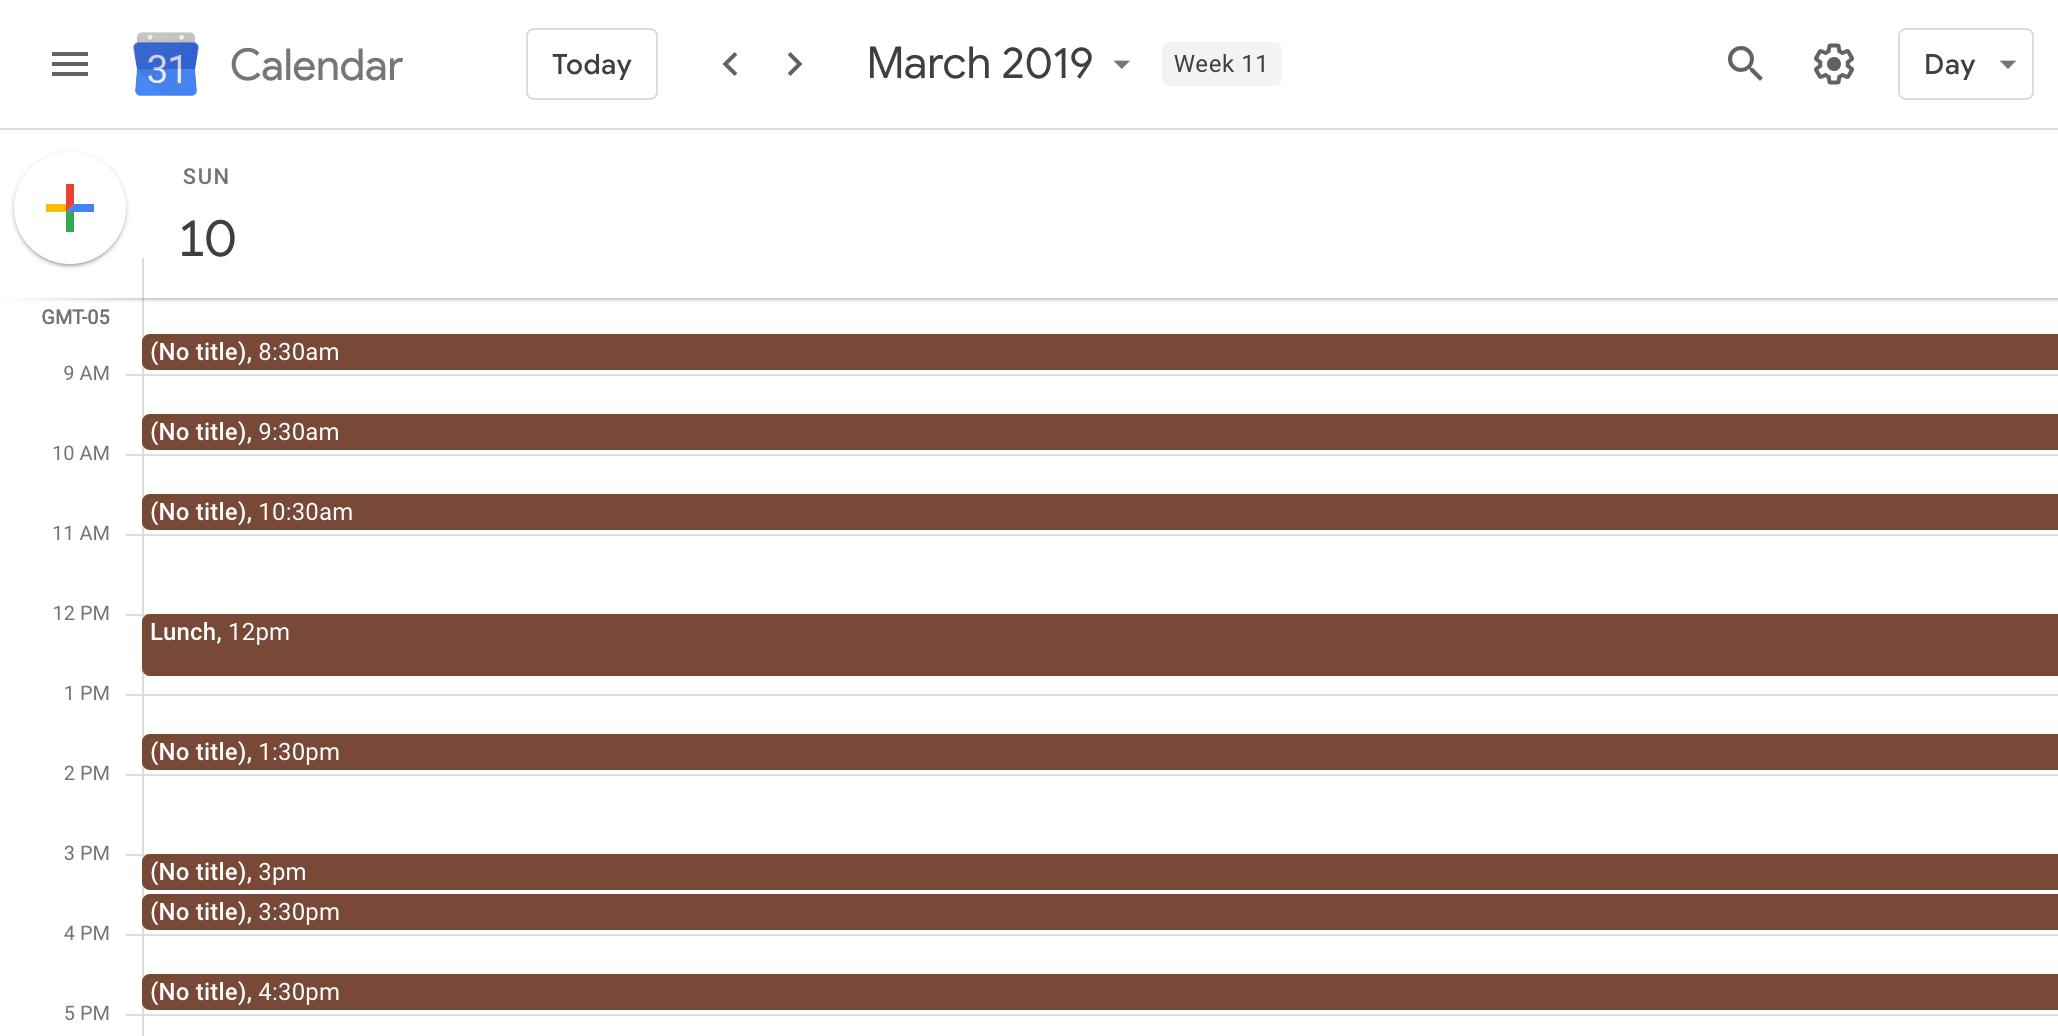 Fragmented schedule